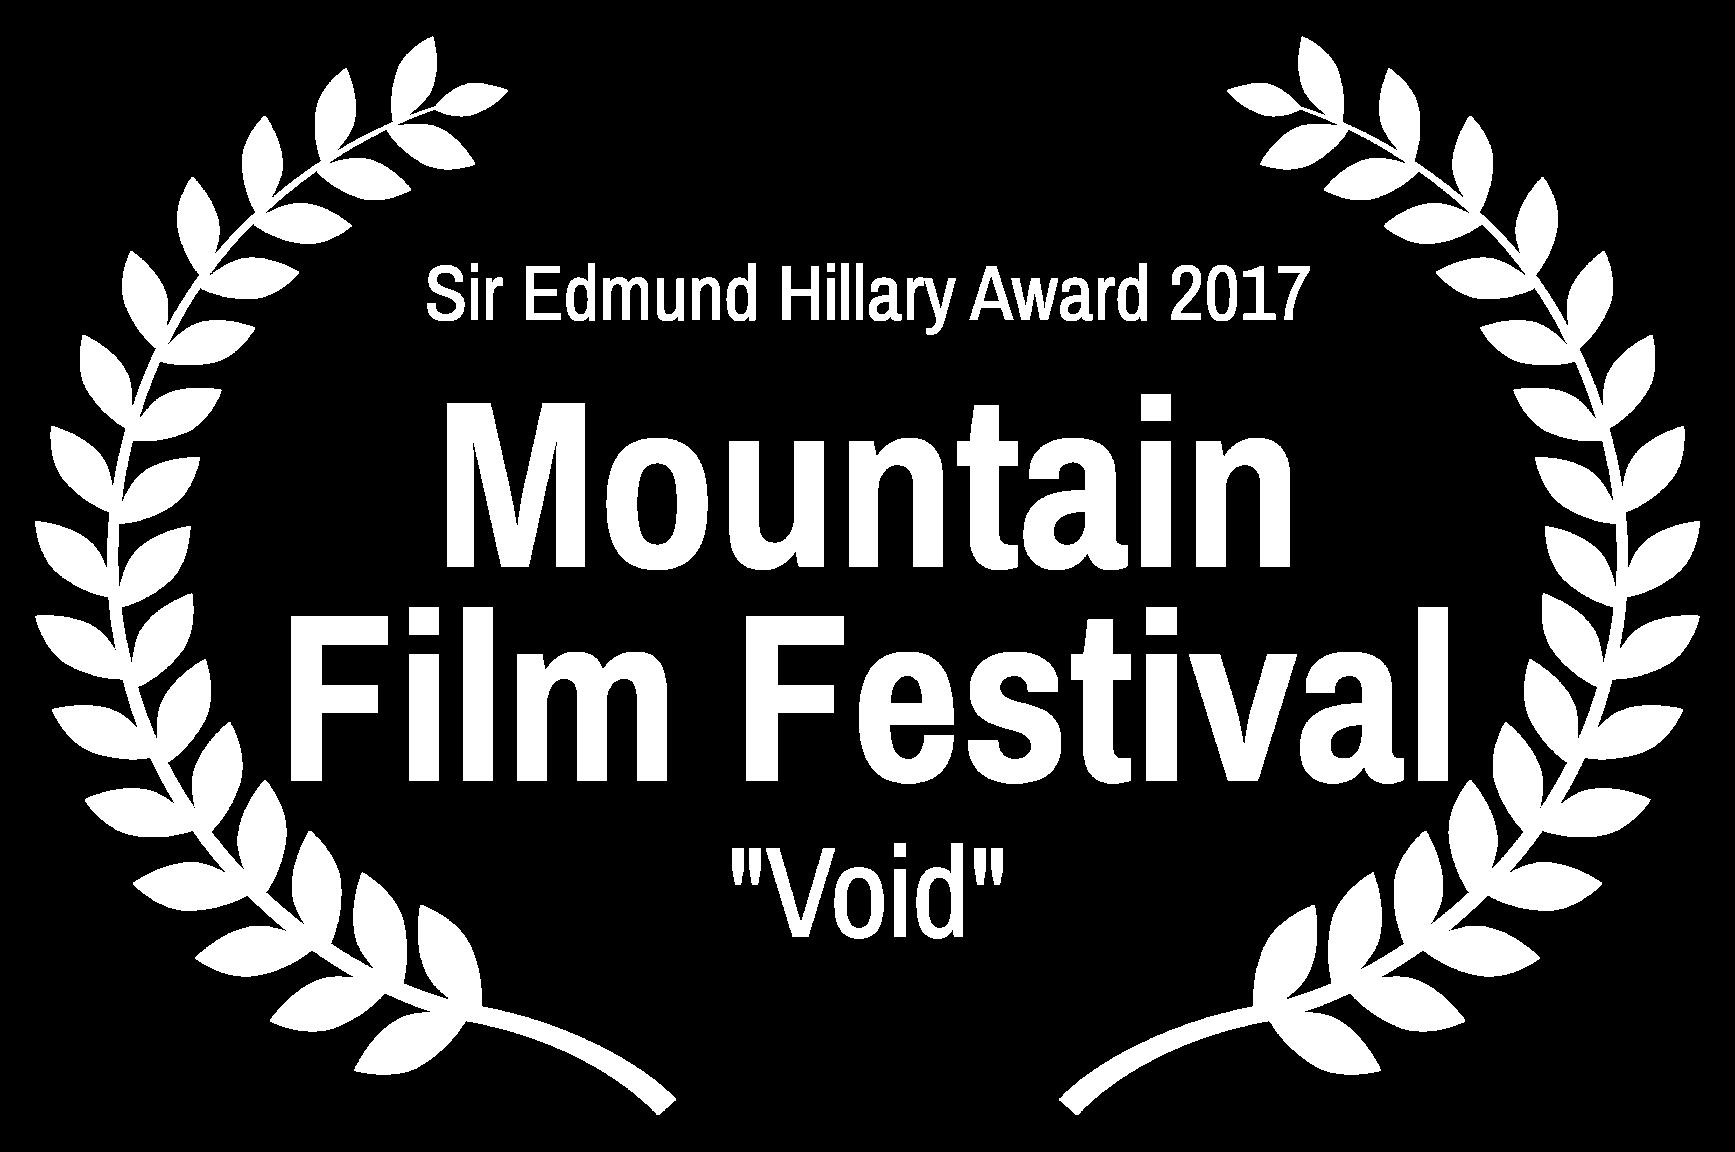 Sir Edmund Hillary Award 2017 - Mountain Film Festival - Void.png